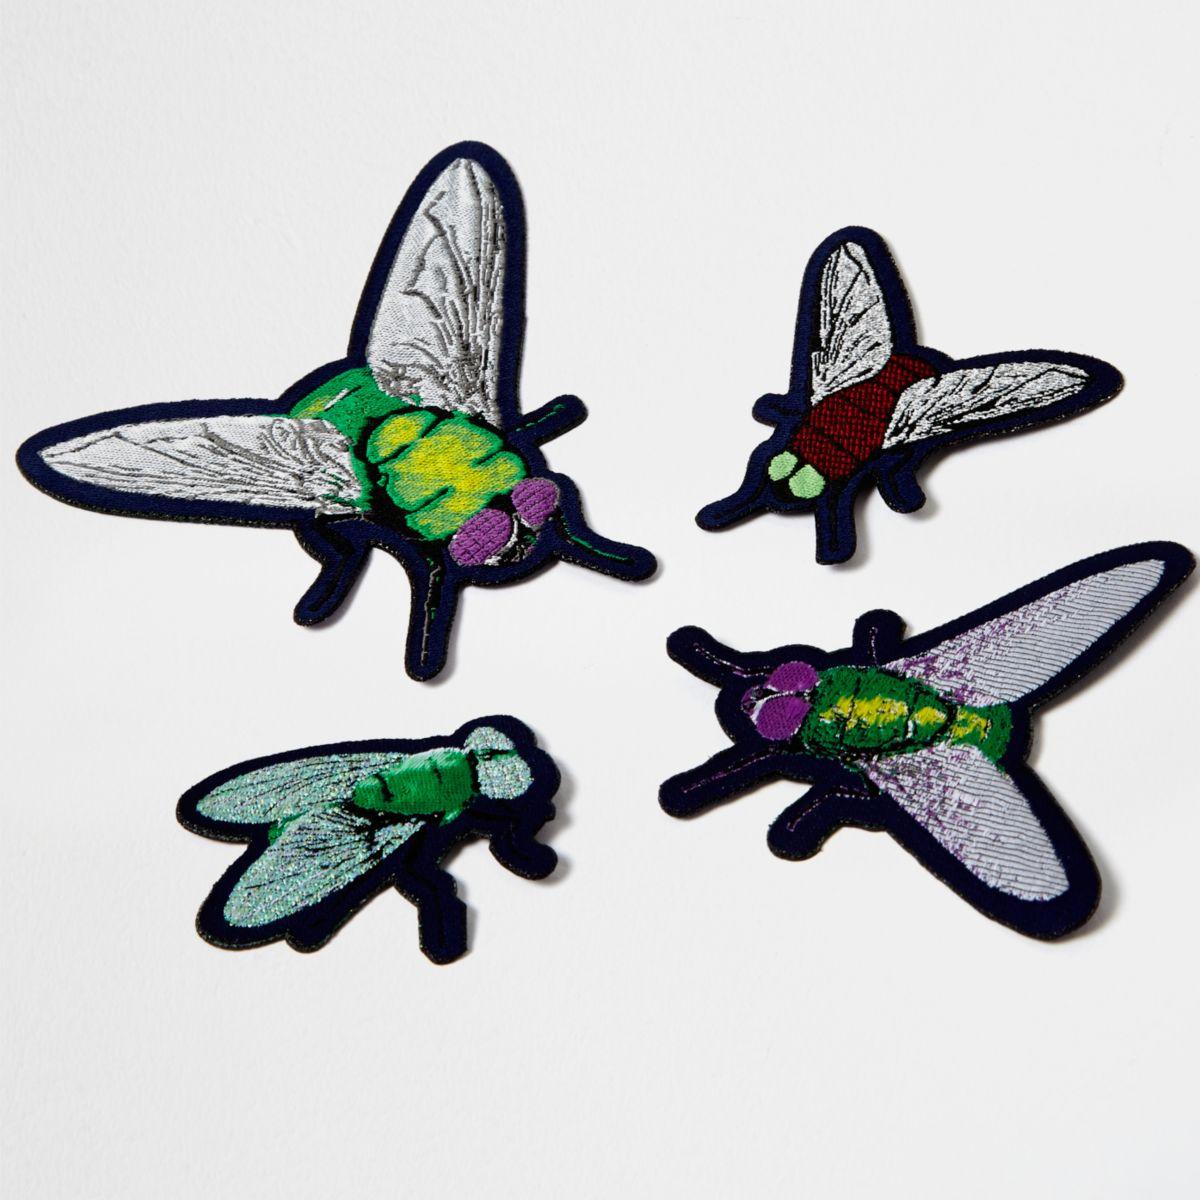 Broches insectes vertes Design Forum